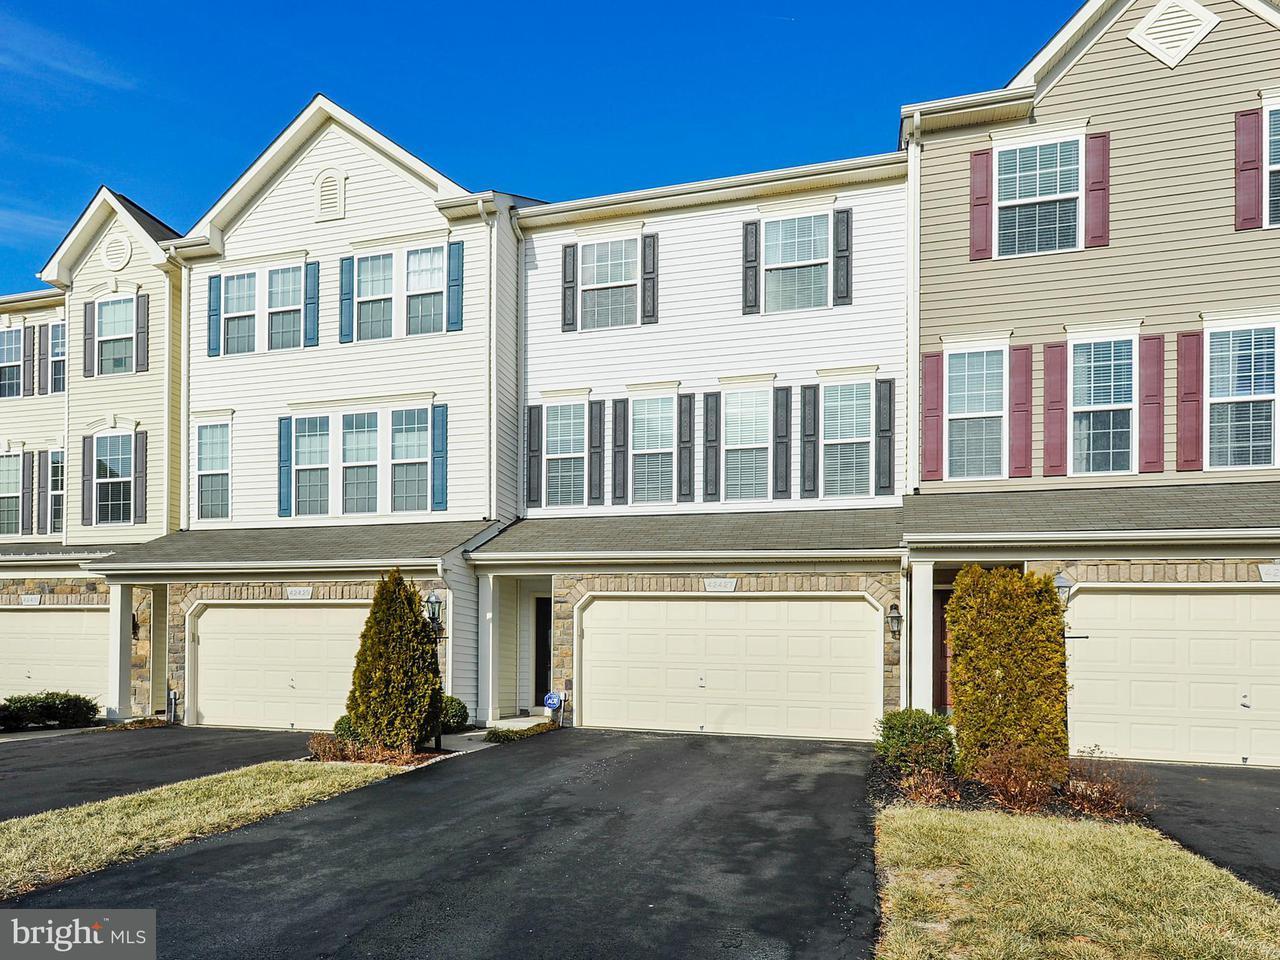 Townhouse for Sale at 42427 Angela Faye Sq 42427 Angela Faye Sq Ashburn, Virginia 20148 United States